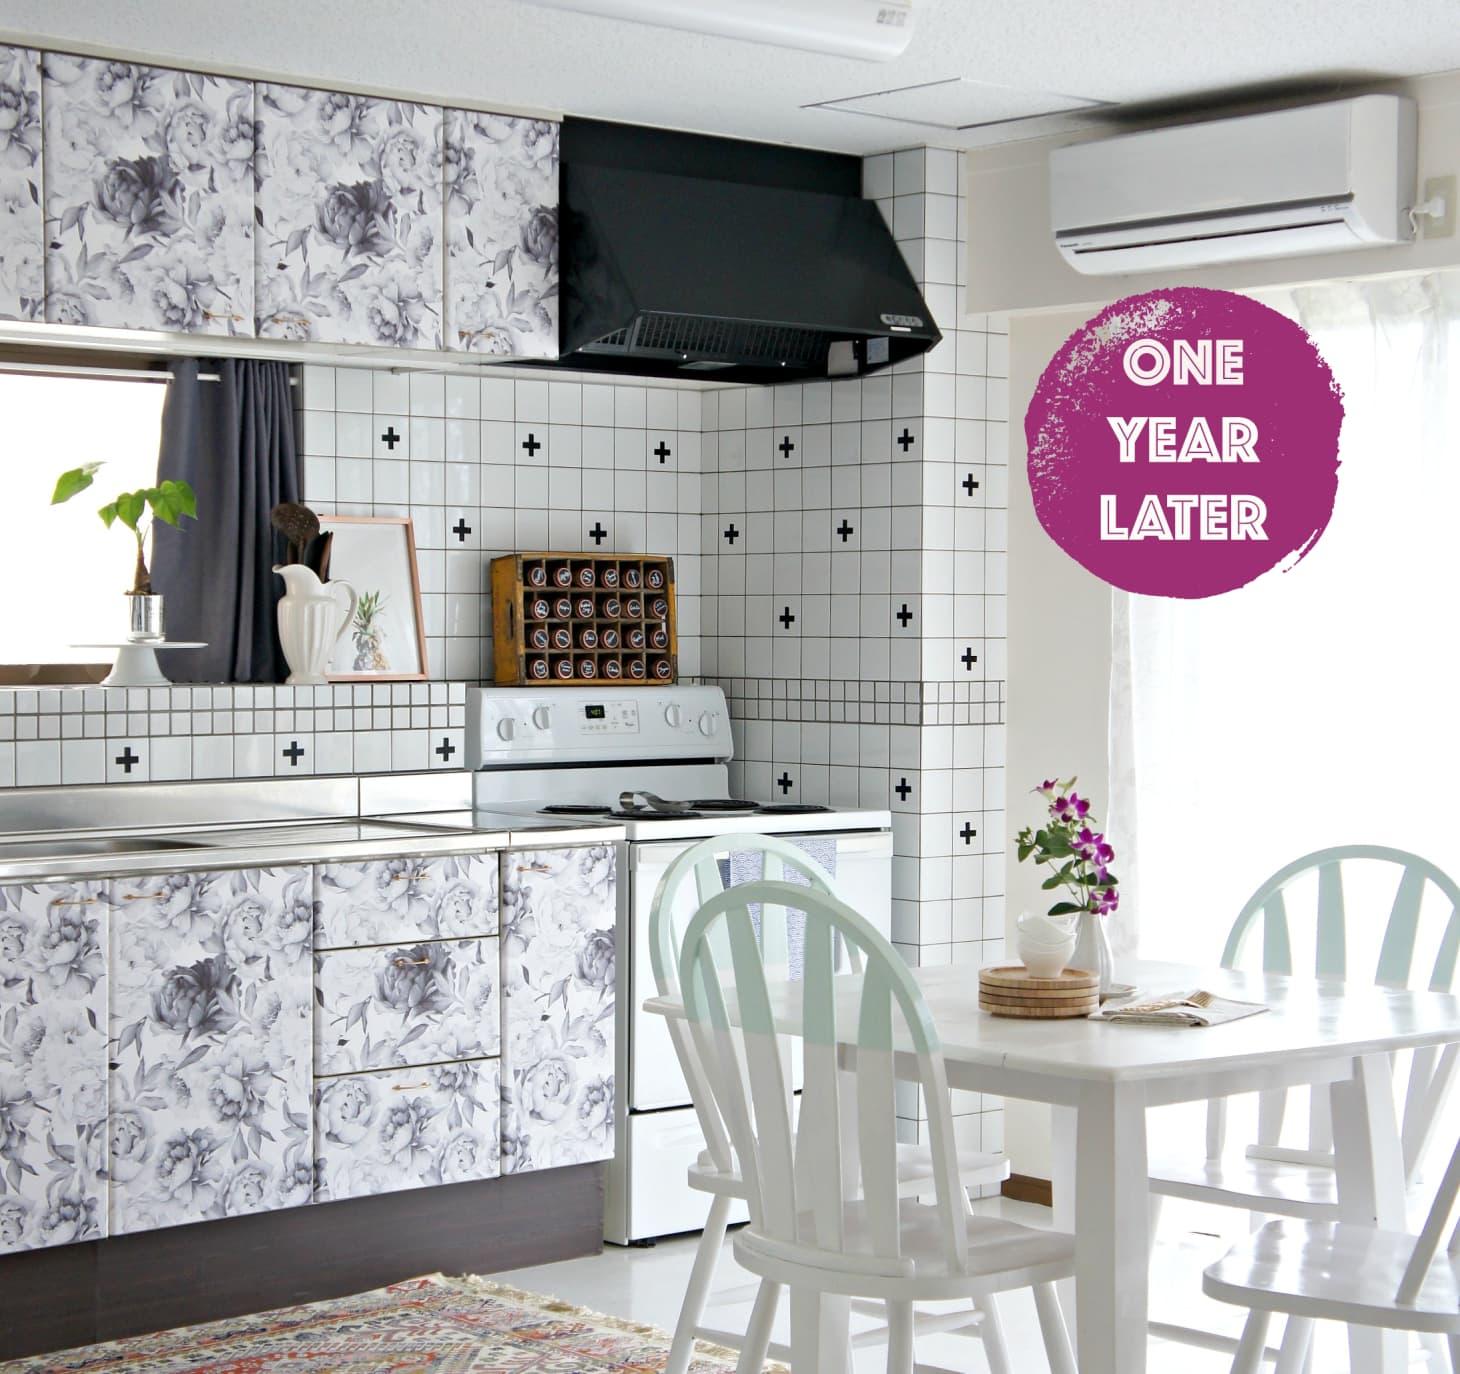 Apartment Rental Reviews: Decorative Window Film: Renter Review + Sources